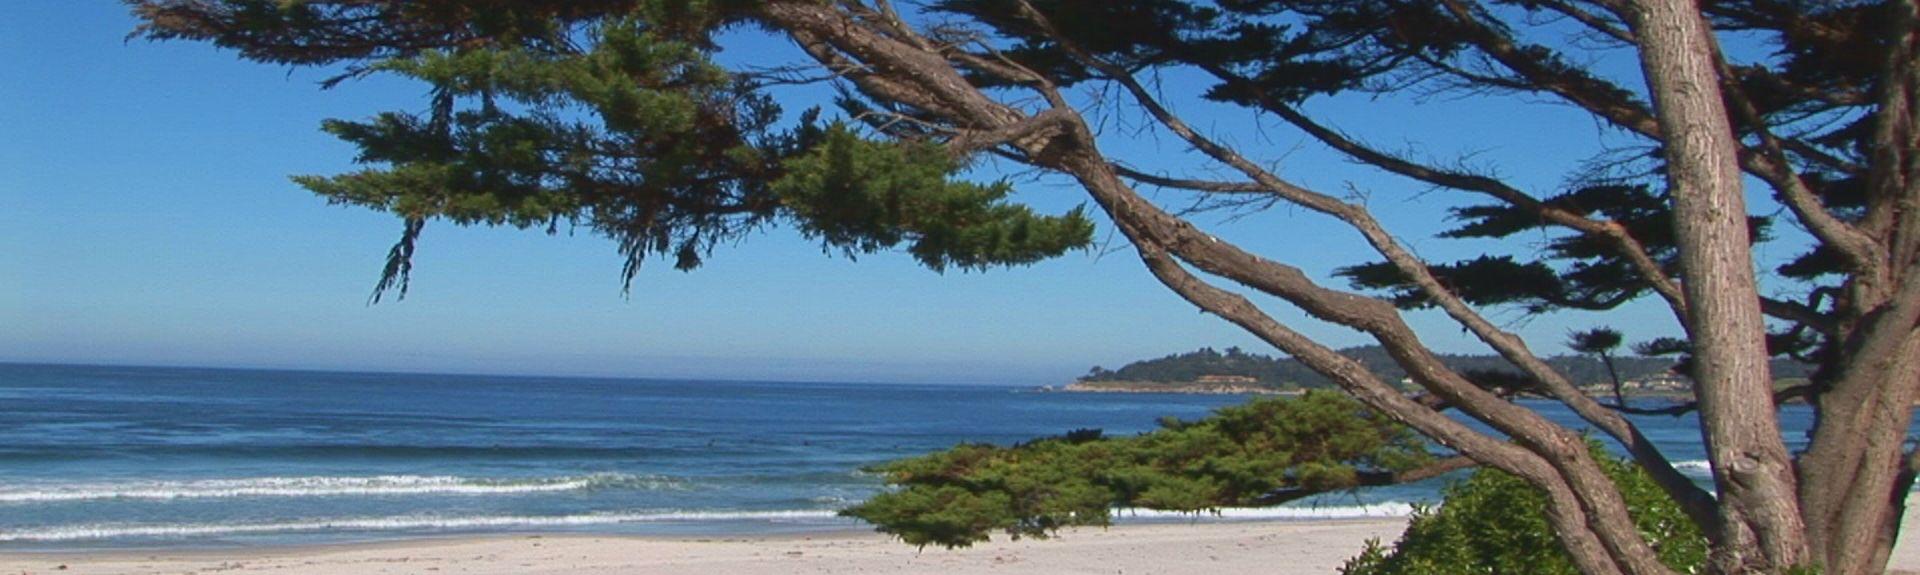 Playa estatal Moss Landing, Moss Landing, California, Estados Unidos